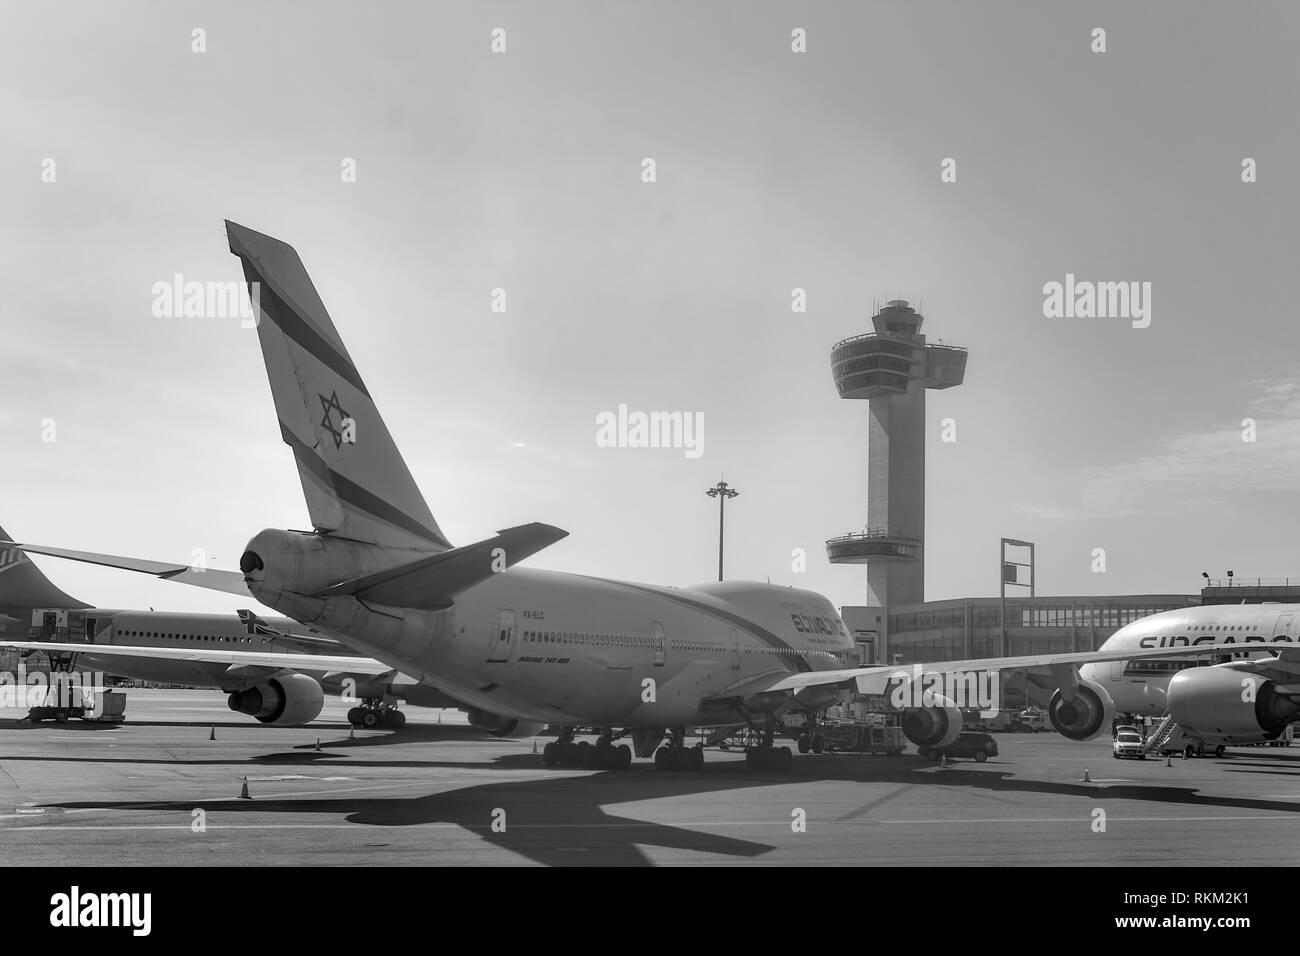 NEW YORK - MARCH 22, 2016: El Al Boeing 747 at JFK Airport. El Al is the flag carrier of Israel. Stock Photo